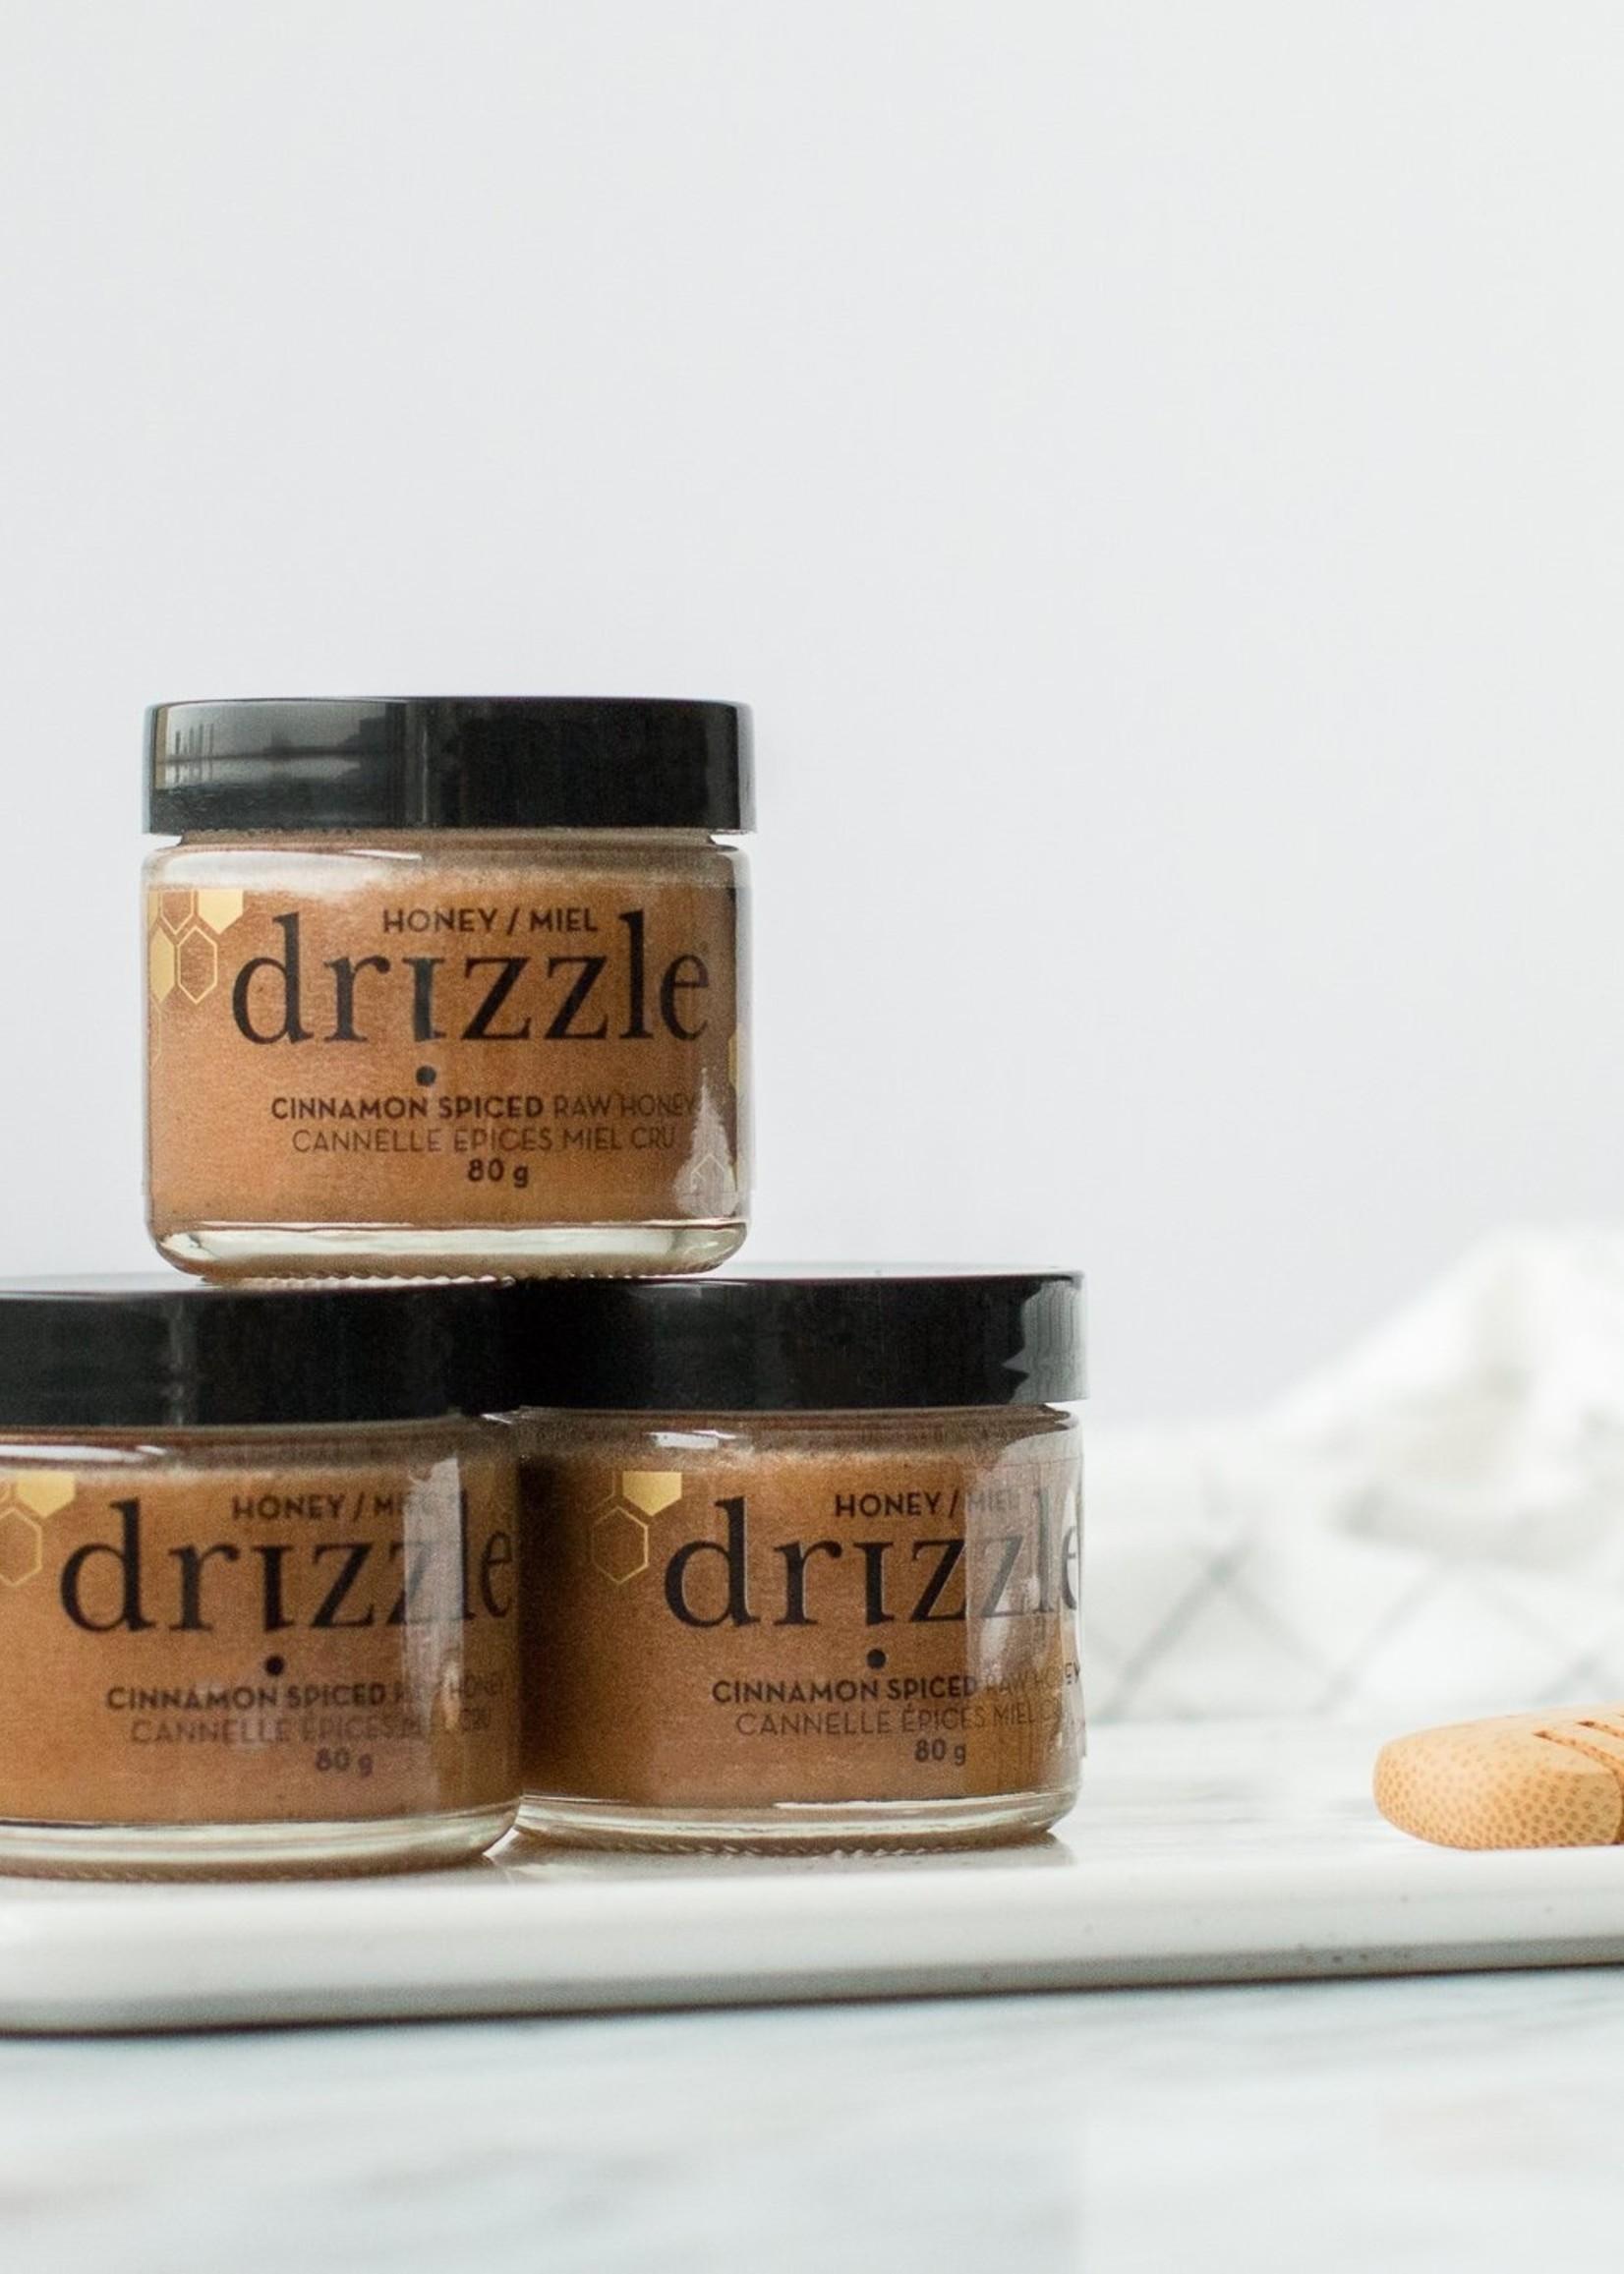 Drizzle Honey Cinnamon Spiced Honey | 80g